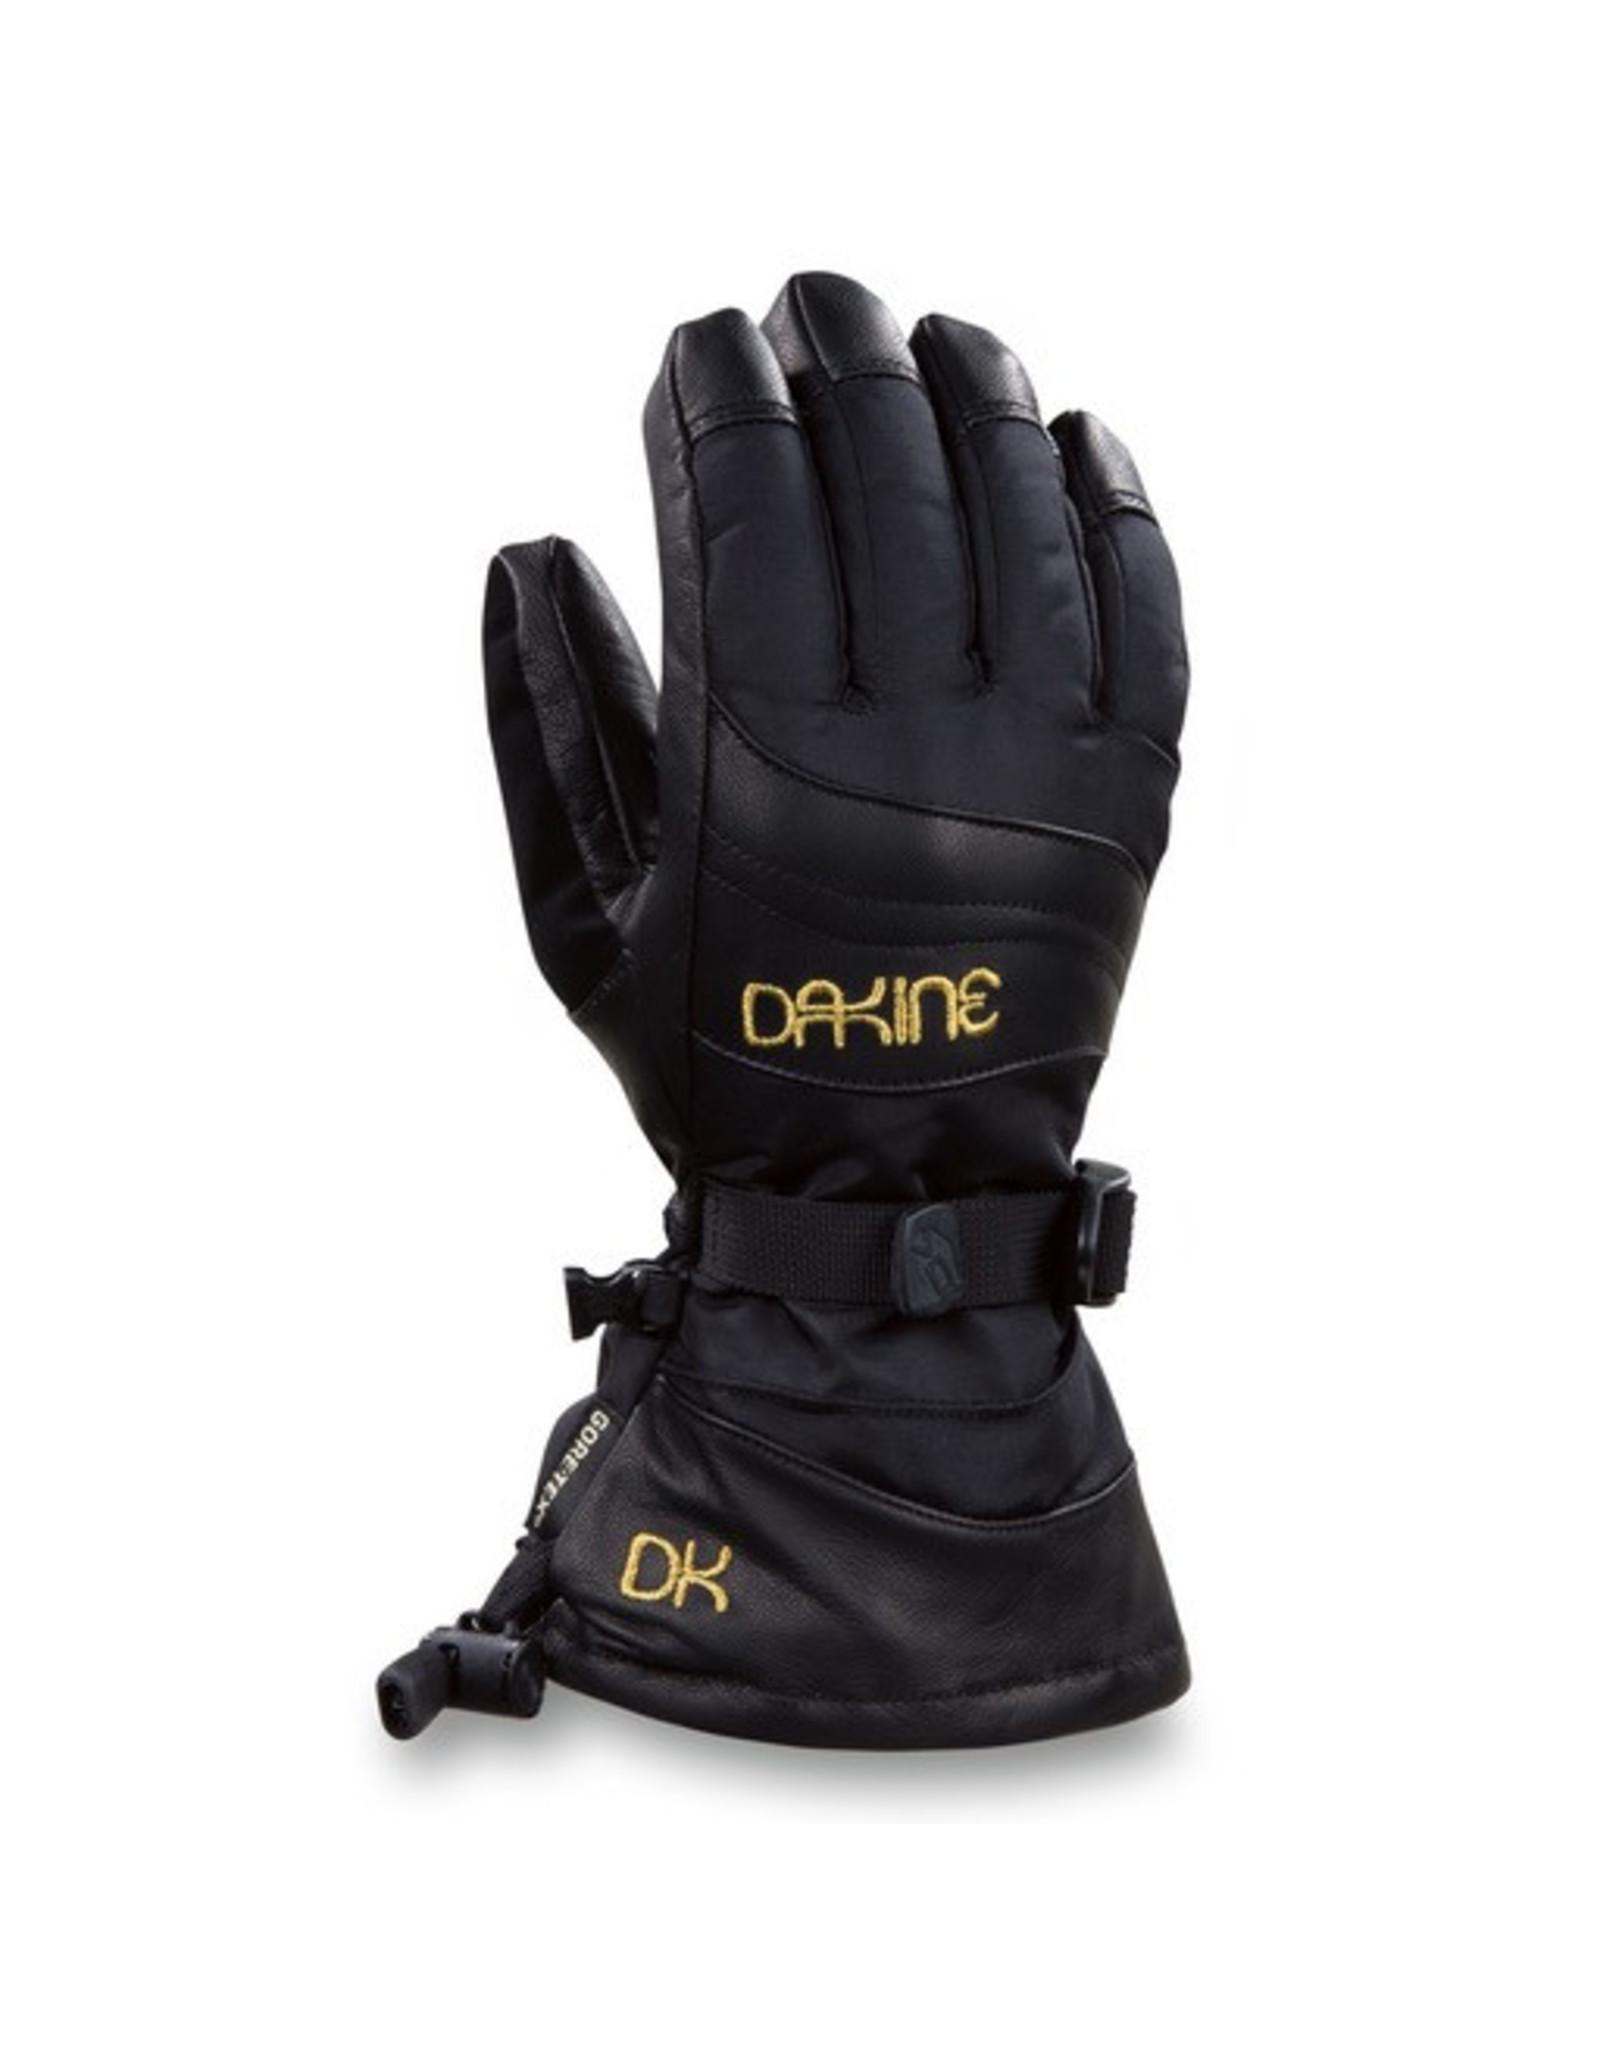 Dakine Dakine - Cougar - S - Black - Glove